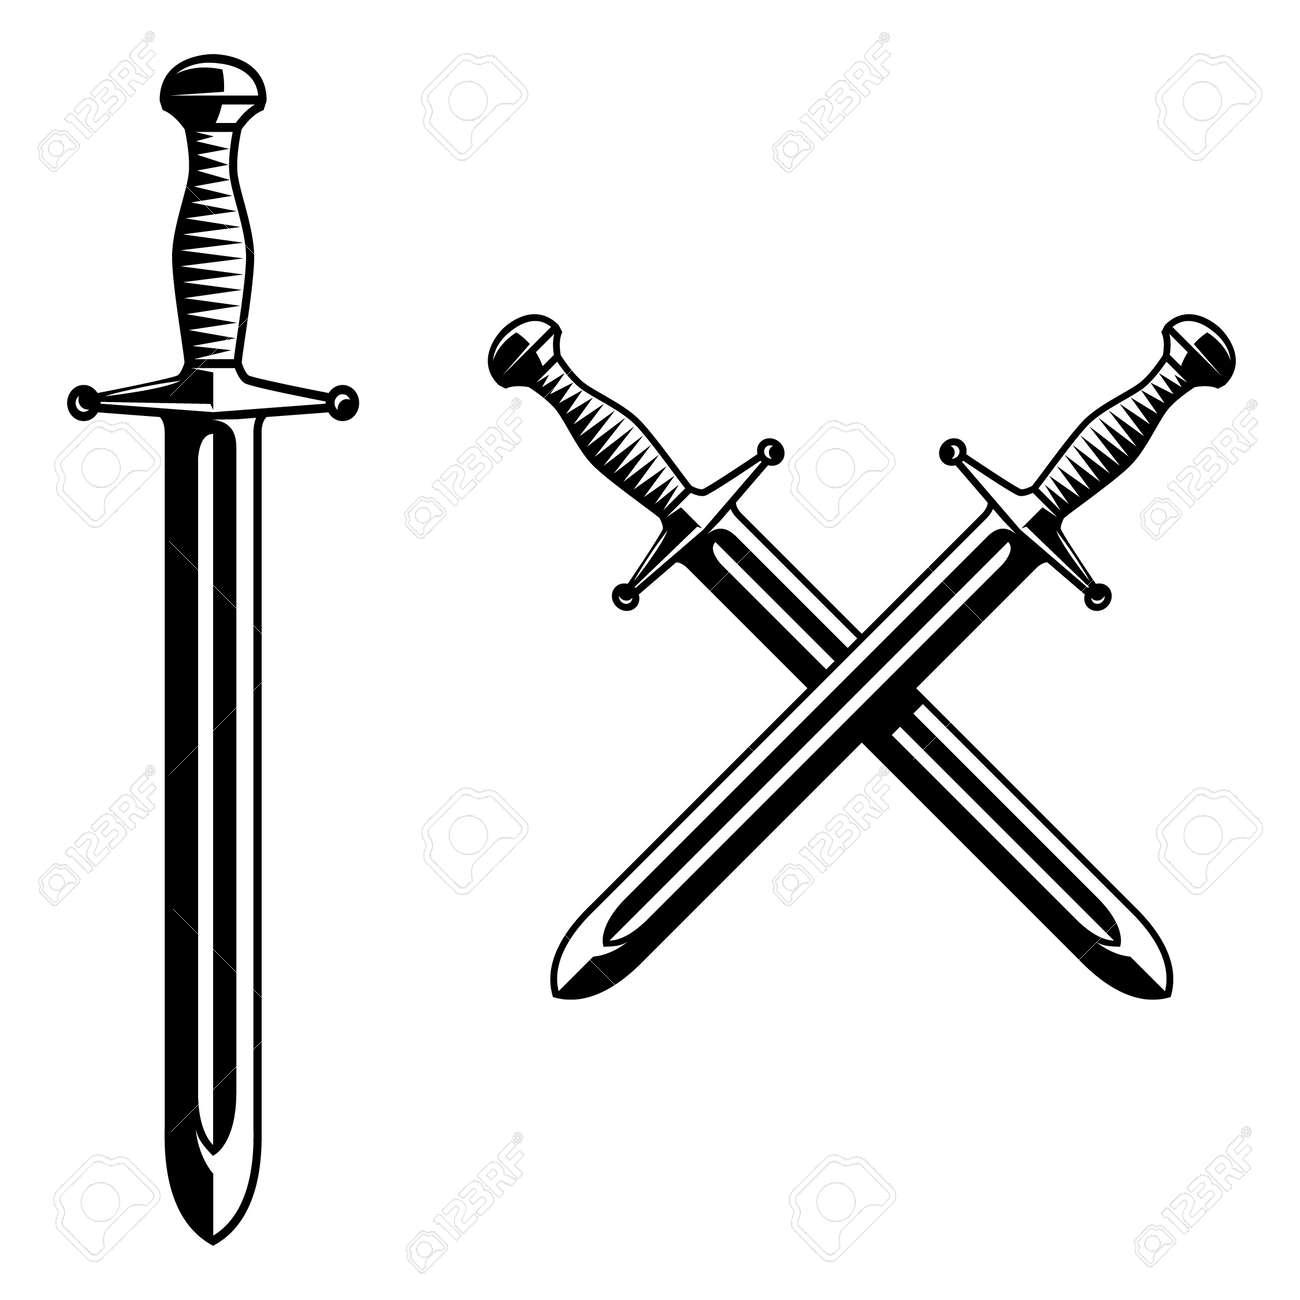 Illustration of knight swords in monochrome style. Design element for logo, label, sign, poster. Vector illustration - 171625094